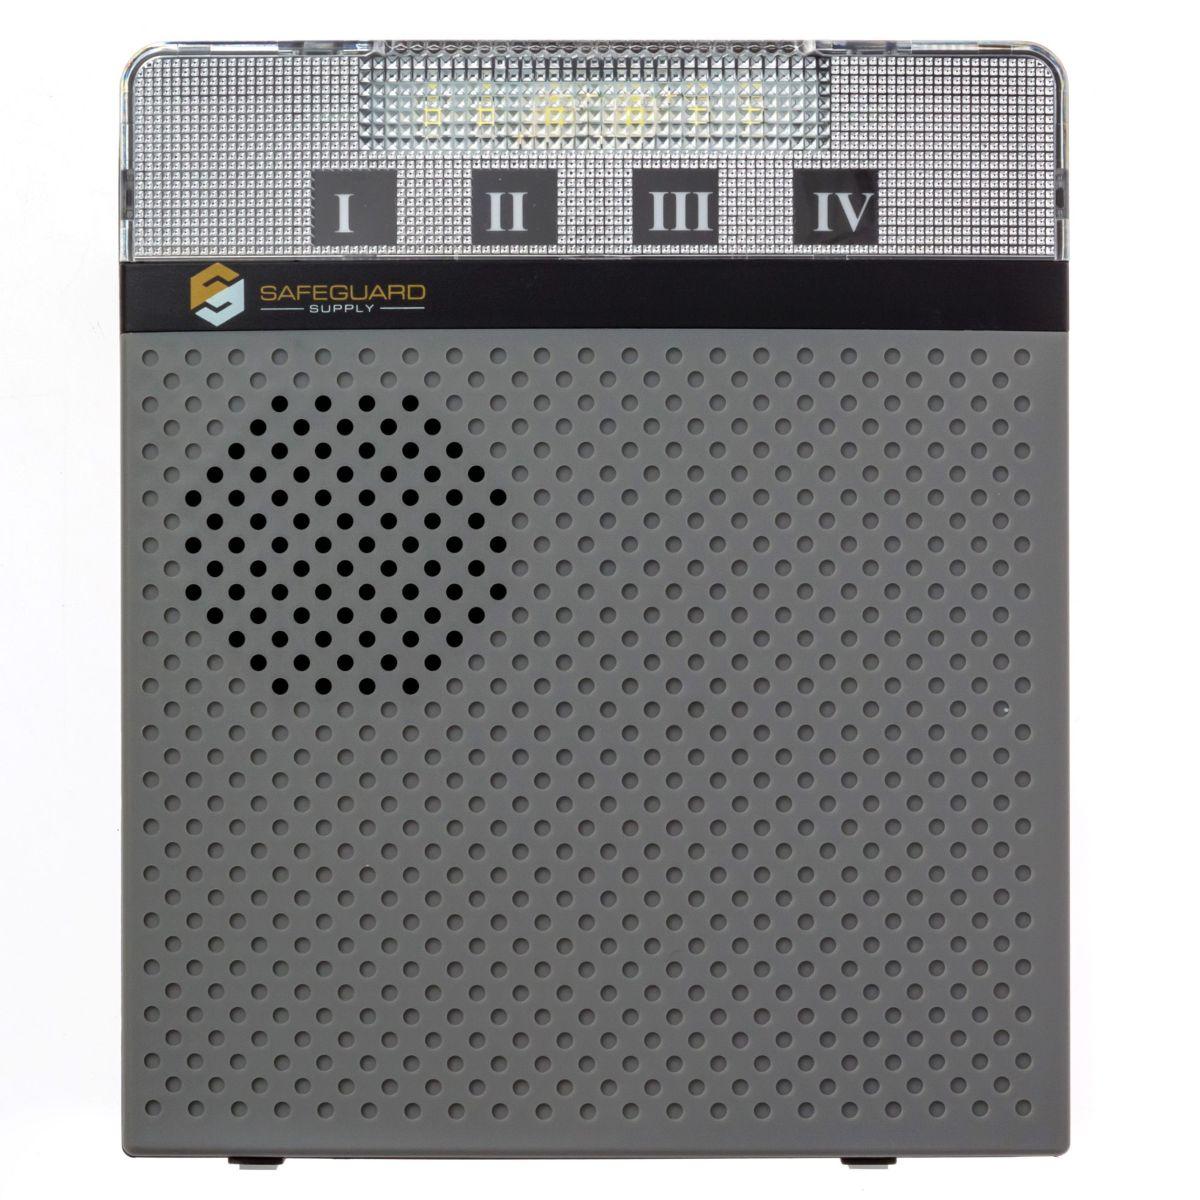 LRA-DCRXA-Wireless Door Chime Receiver with Strobe